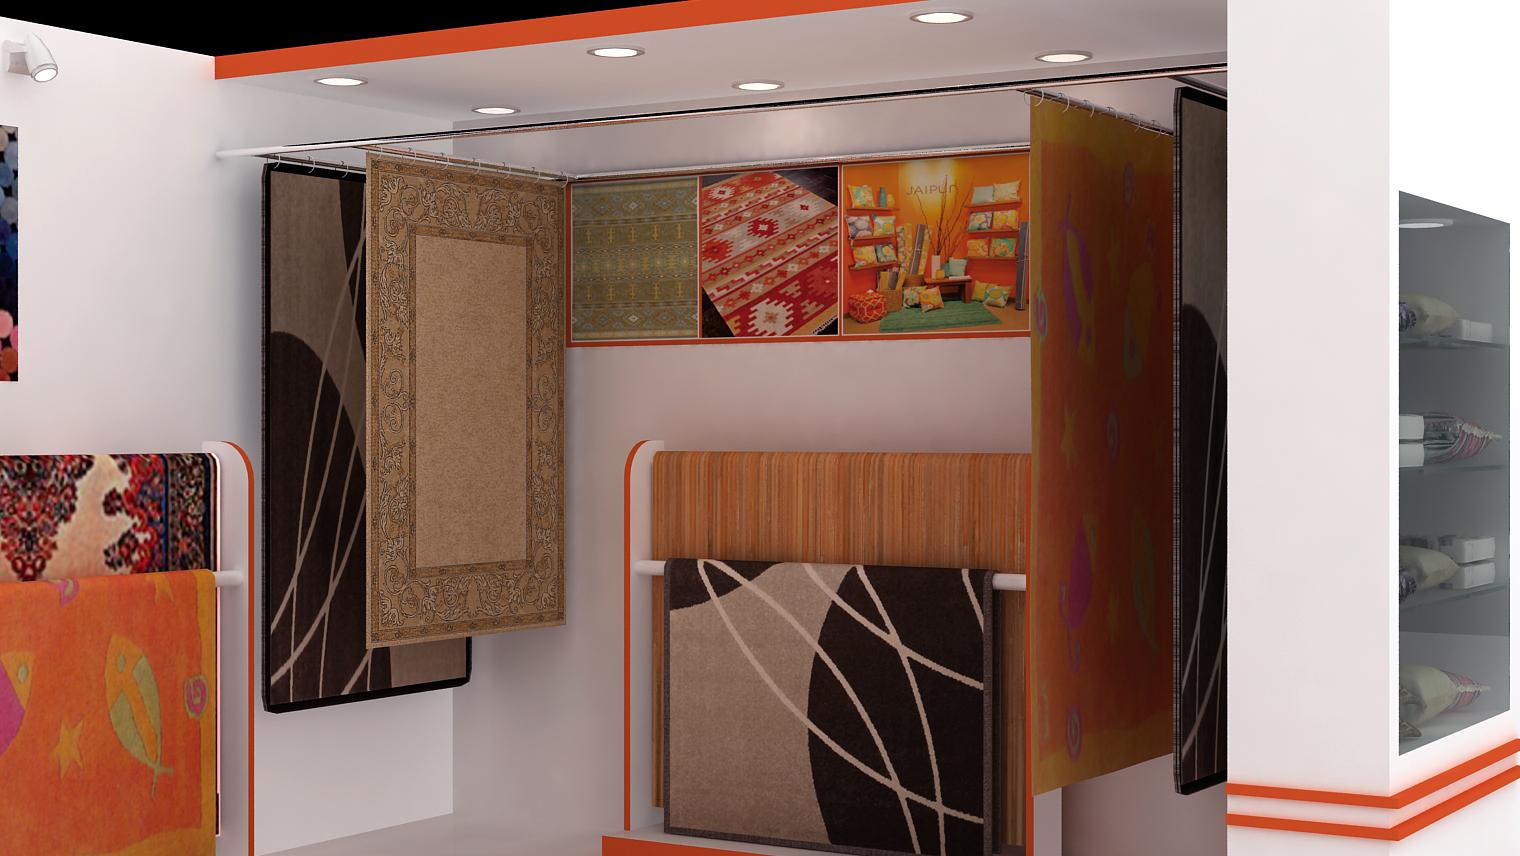 Exhibition Stall Design Coroflot : Exhibition stall design by asad ali at coroflot